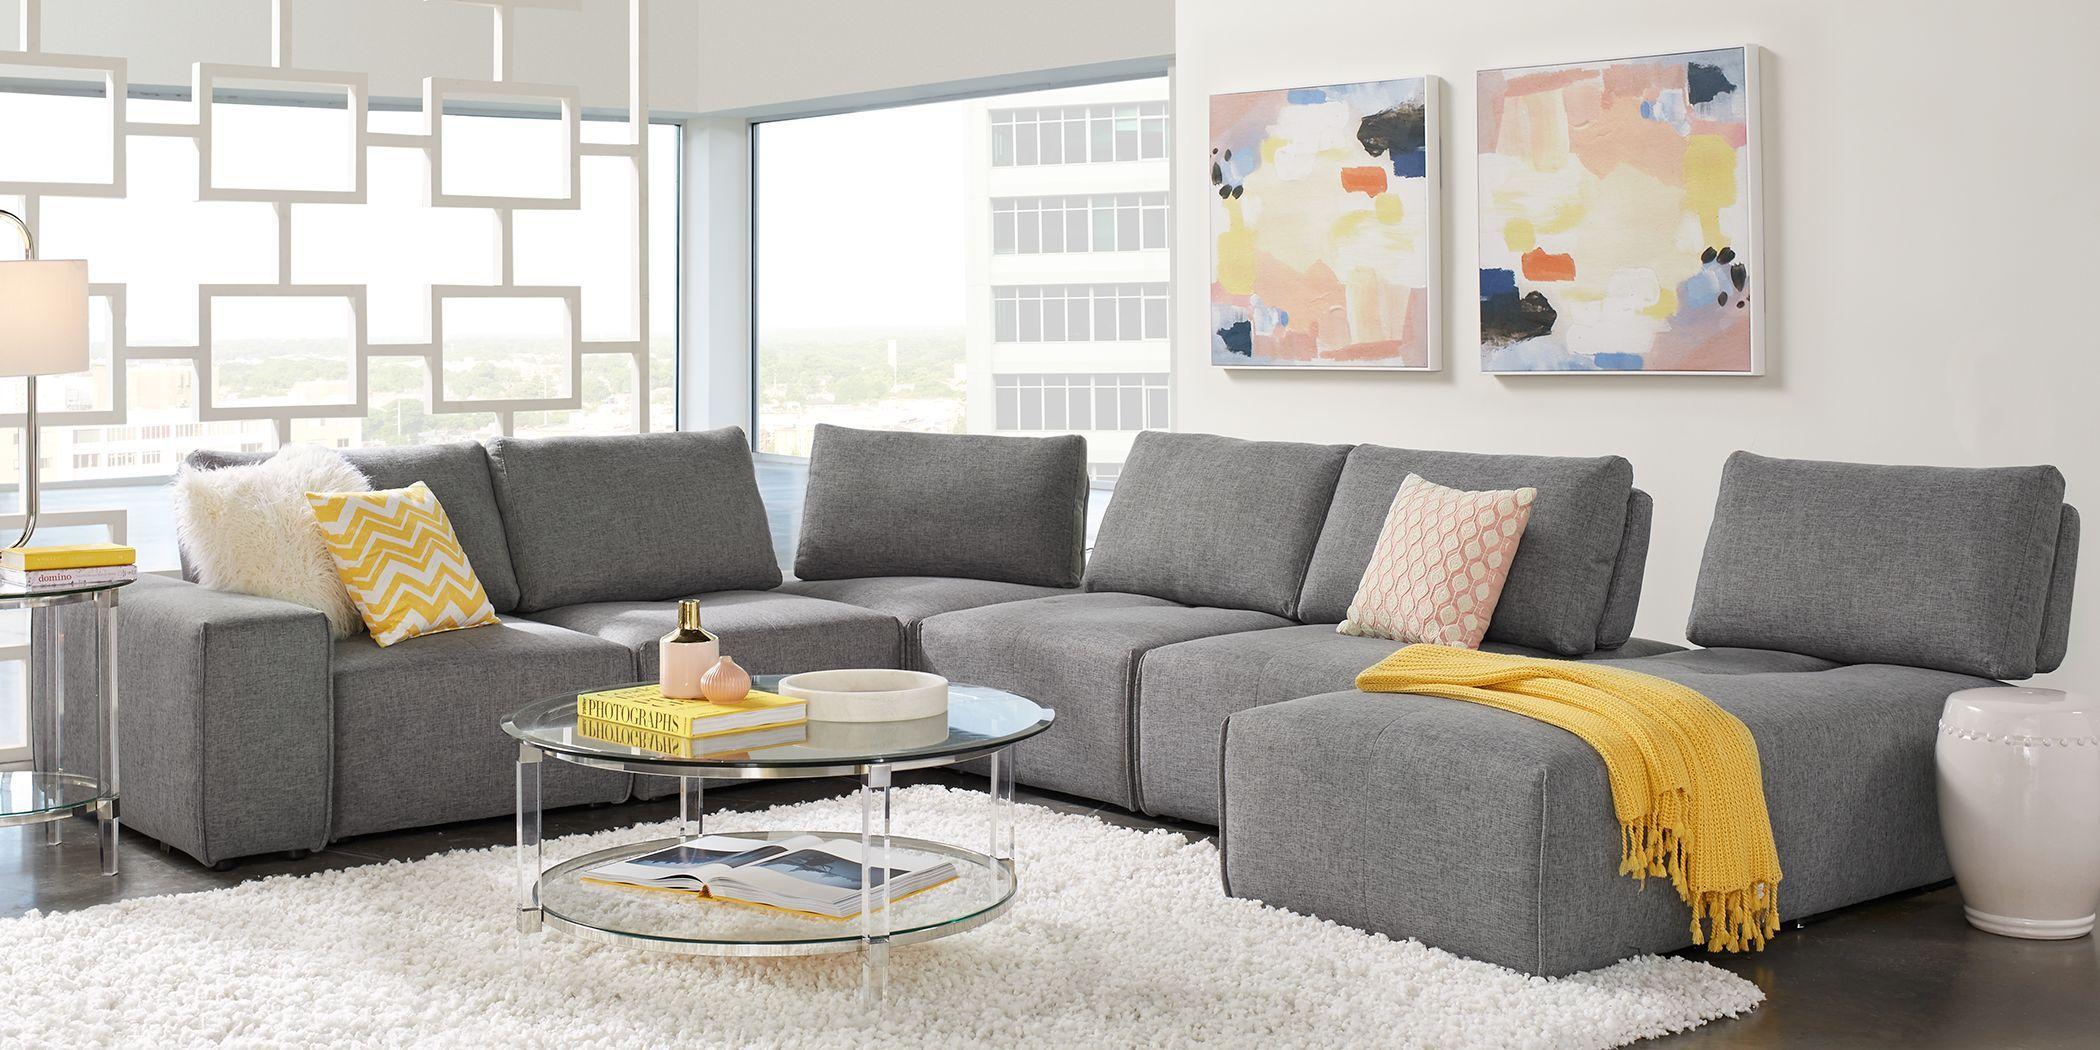 Laney Park Dark Gray 7 Pc Sectional In 2020 Living Room Sets Furniture Furniture Living Room Suite #oversized #living #room #furniture #sets